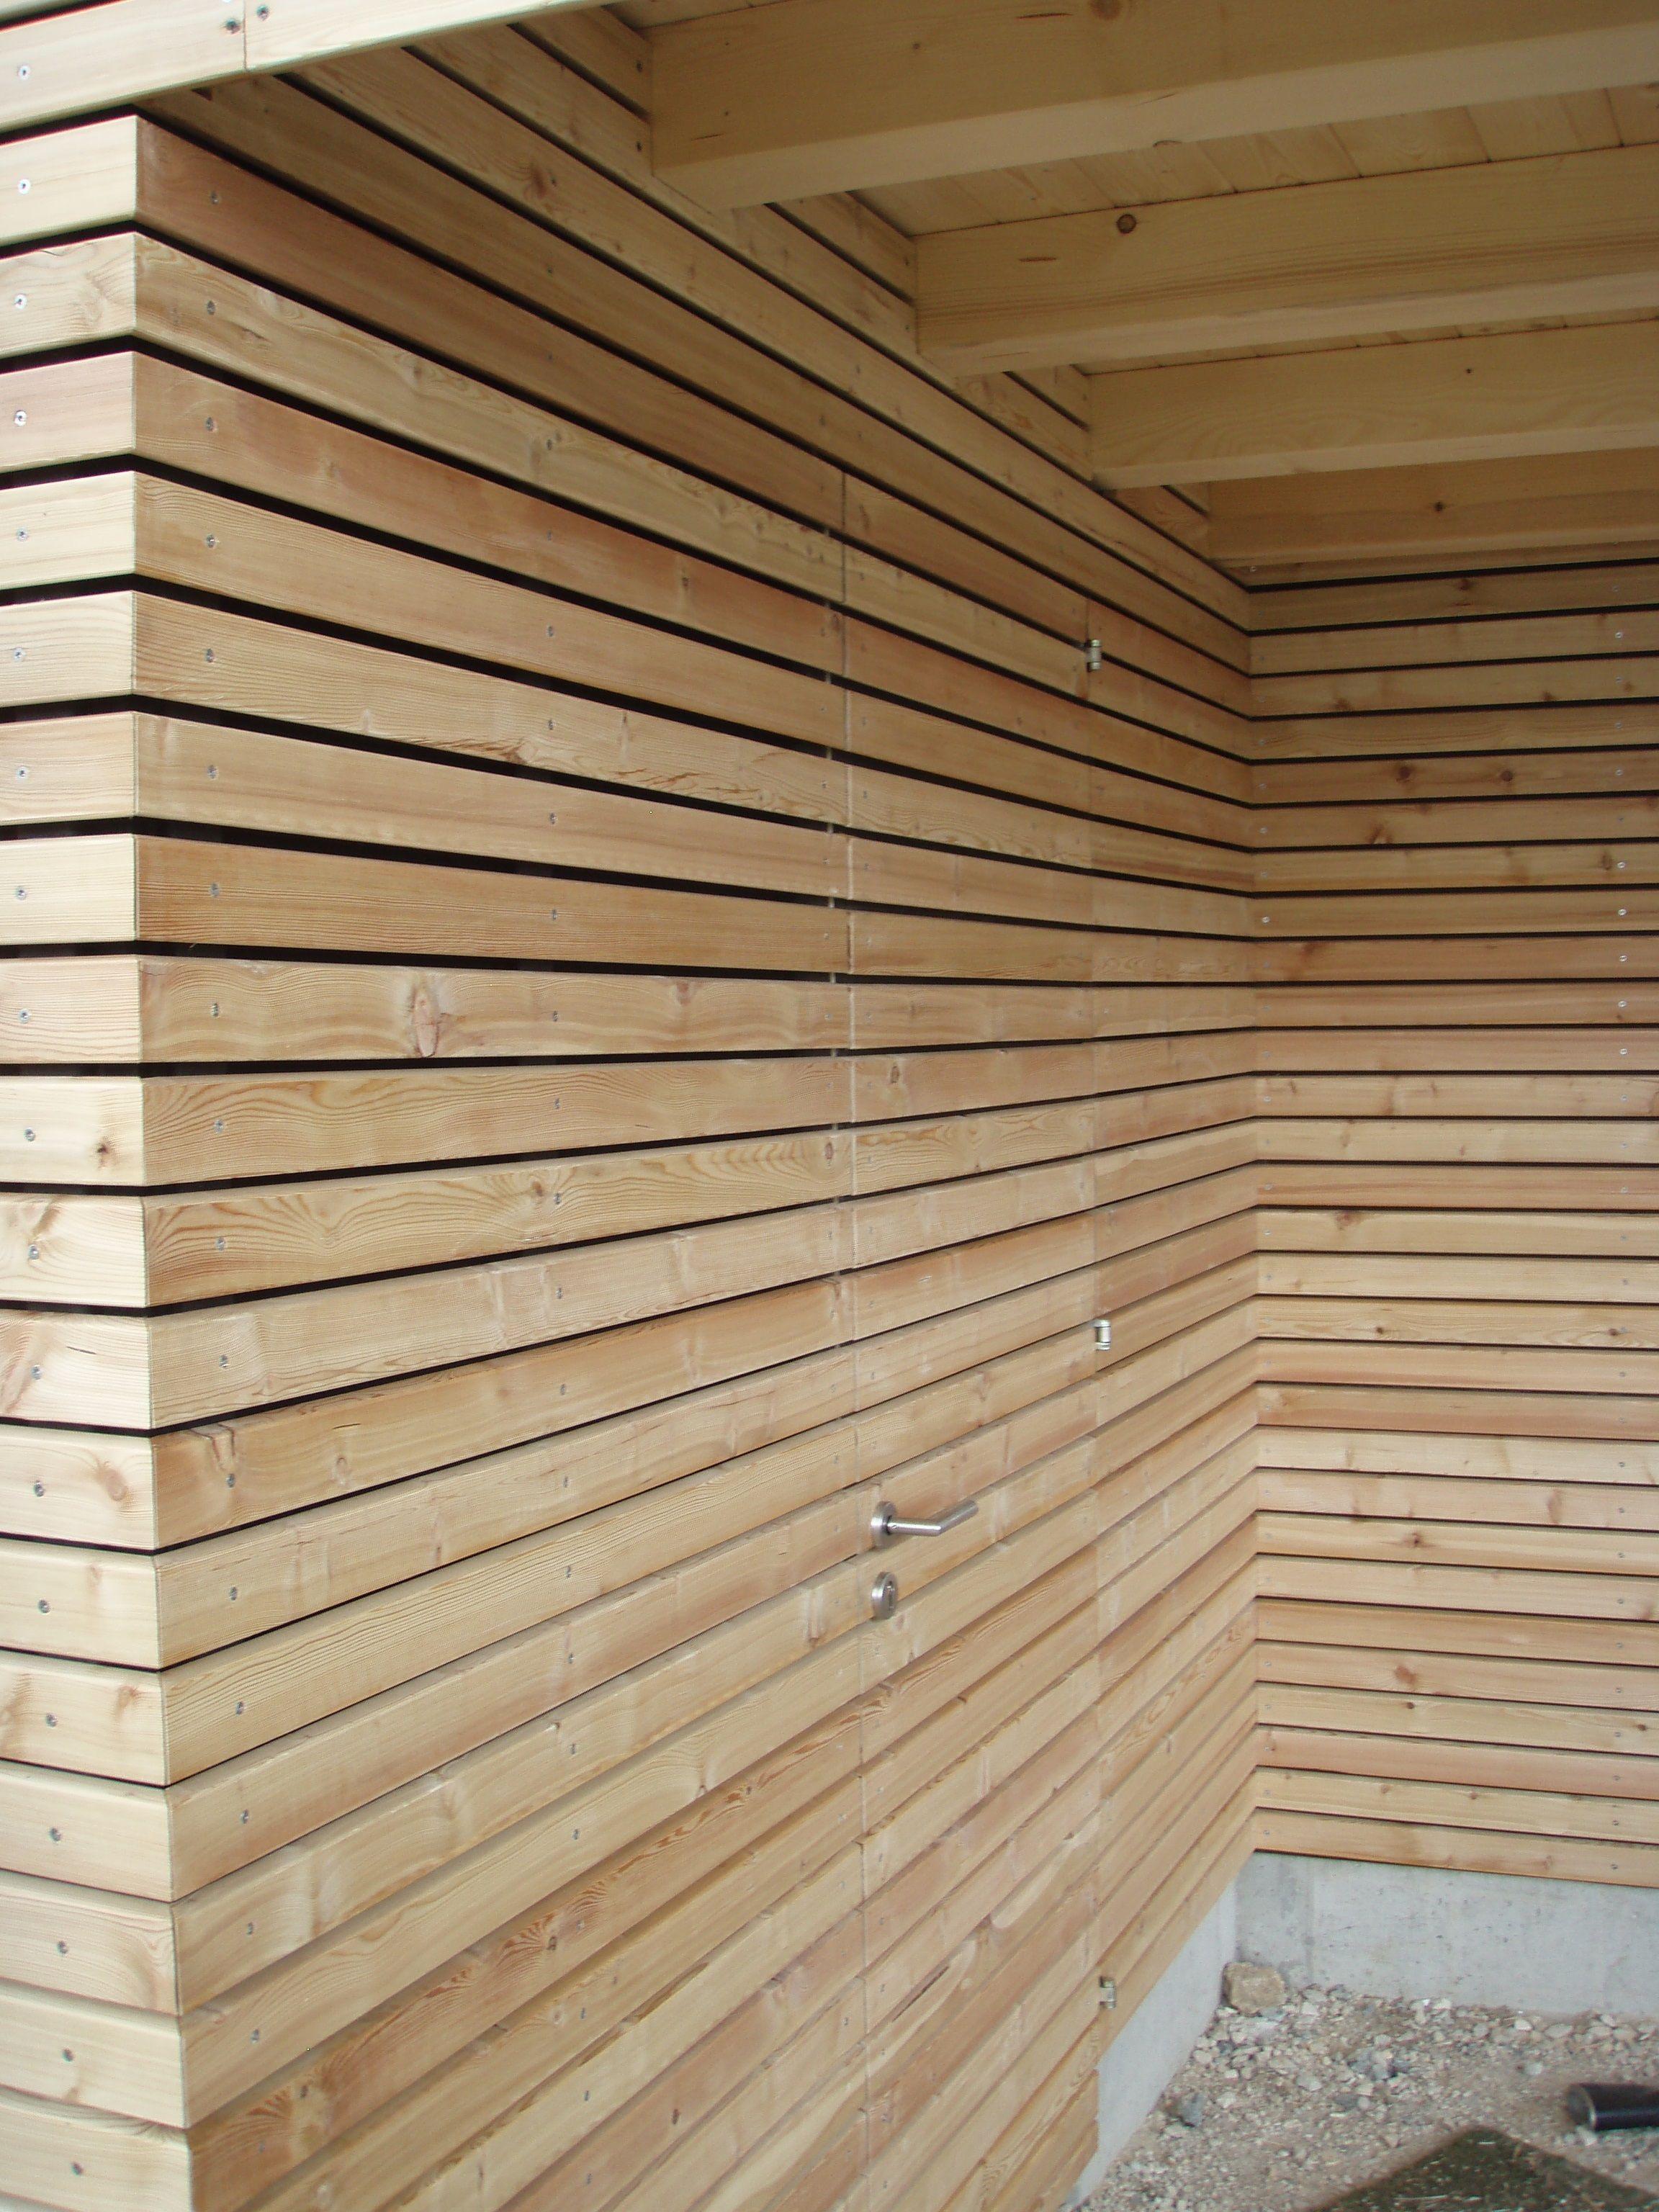 chiemgau werkstatt carport in regensburg carport. Black Bedroom Furniture Sets. Home Design Ideas